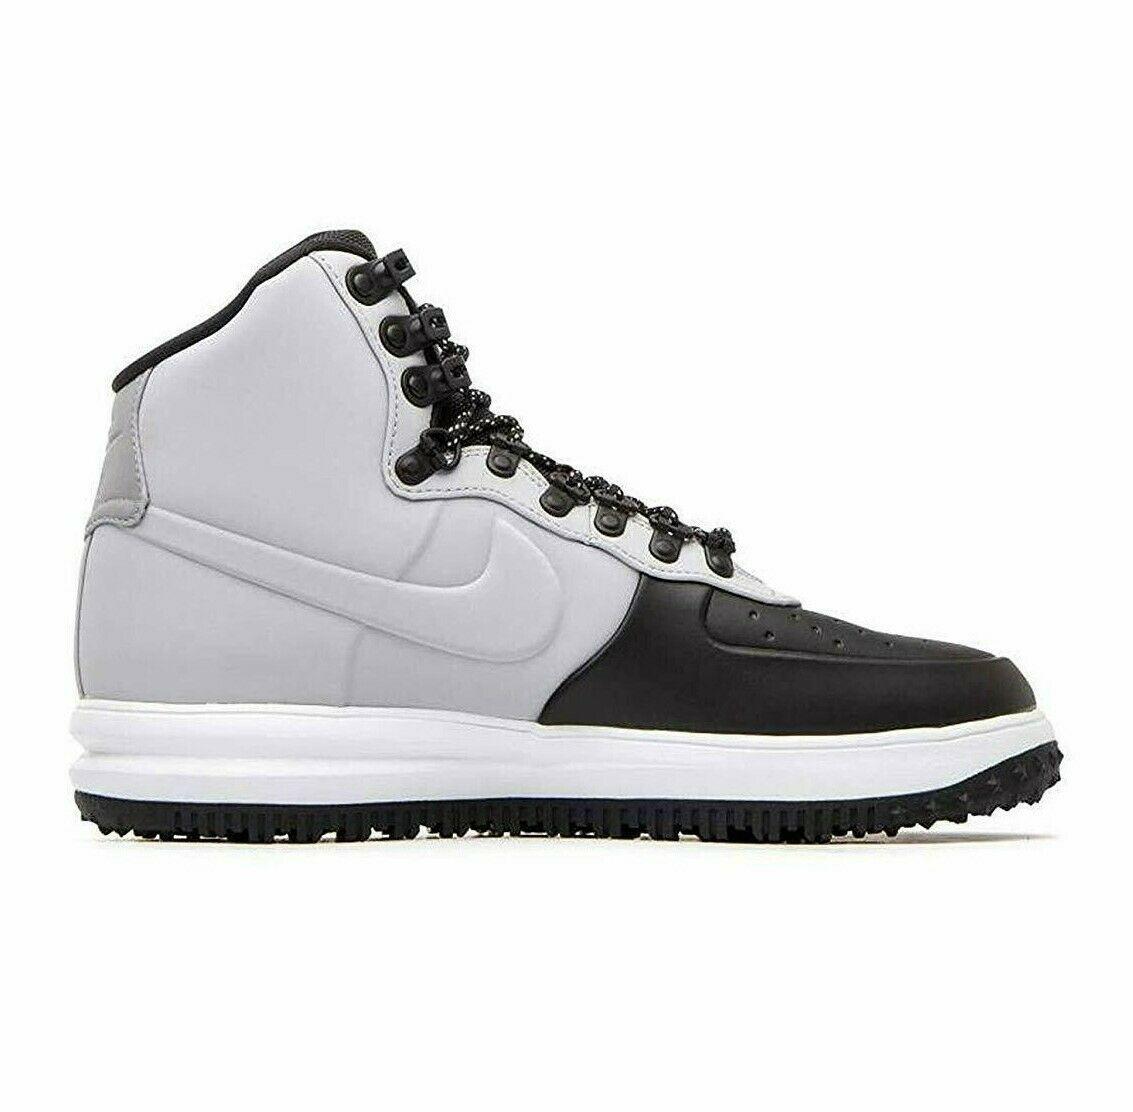 Nike Lunar Force Duckboot Air Force 1 High Wolf Grey Black BQ7930 002 Mens 10.5